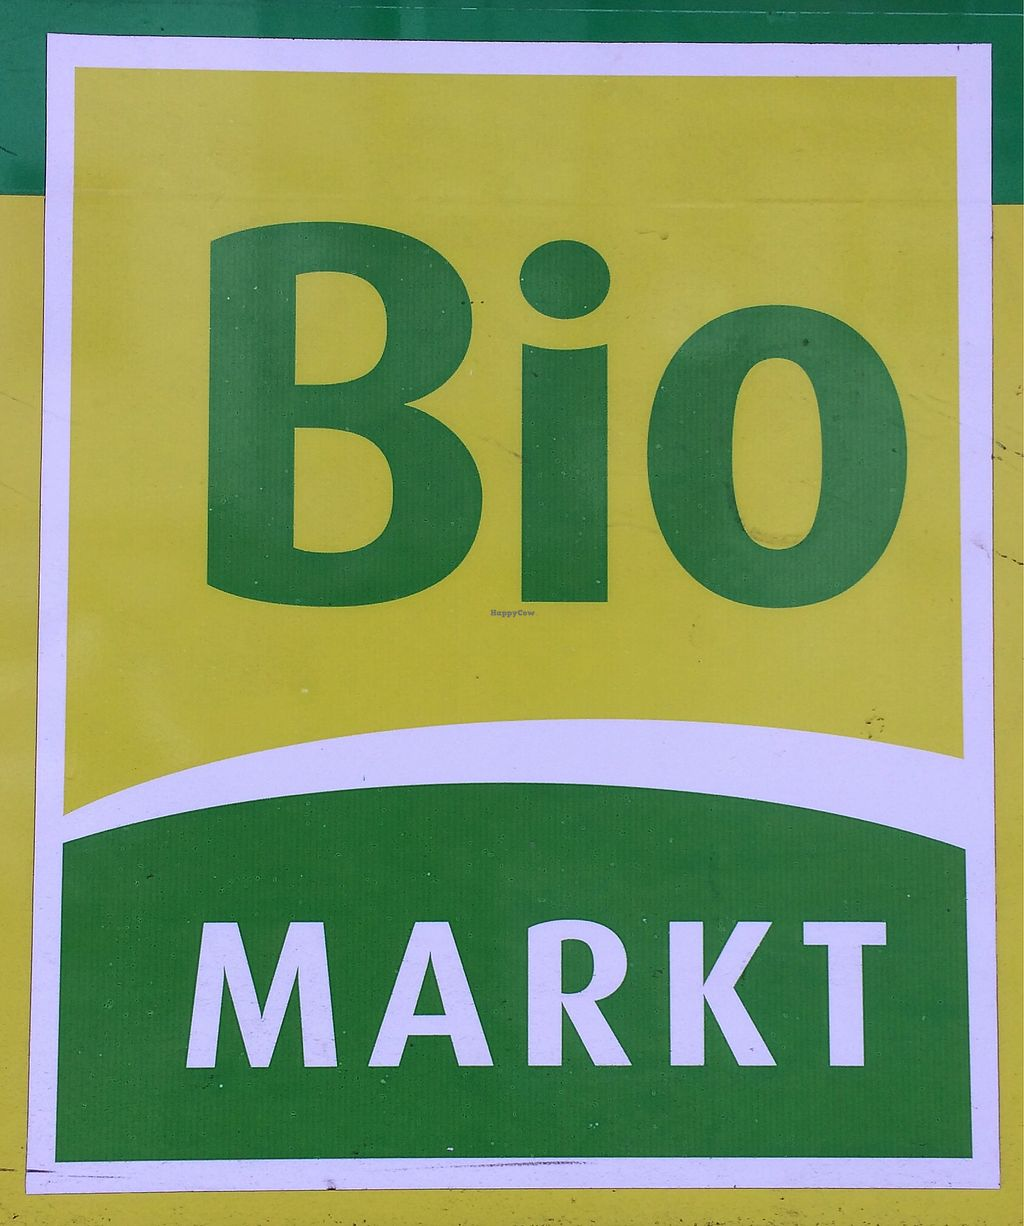 "Photo of Erdi Biomarkt  by <a href=""/members/profile/Carissima"">Carissima</a> <br/>Logo <br/> November 3, 2017  - <a href='/contact/abuse/image/65663/321525'>Report</a>"